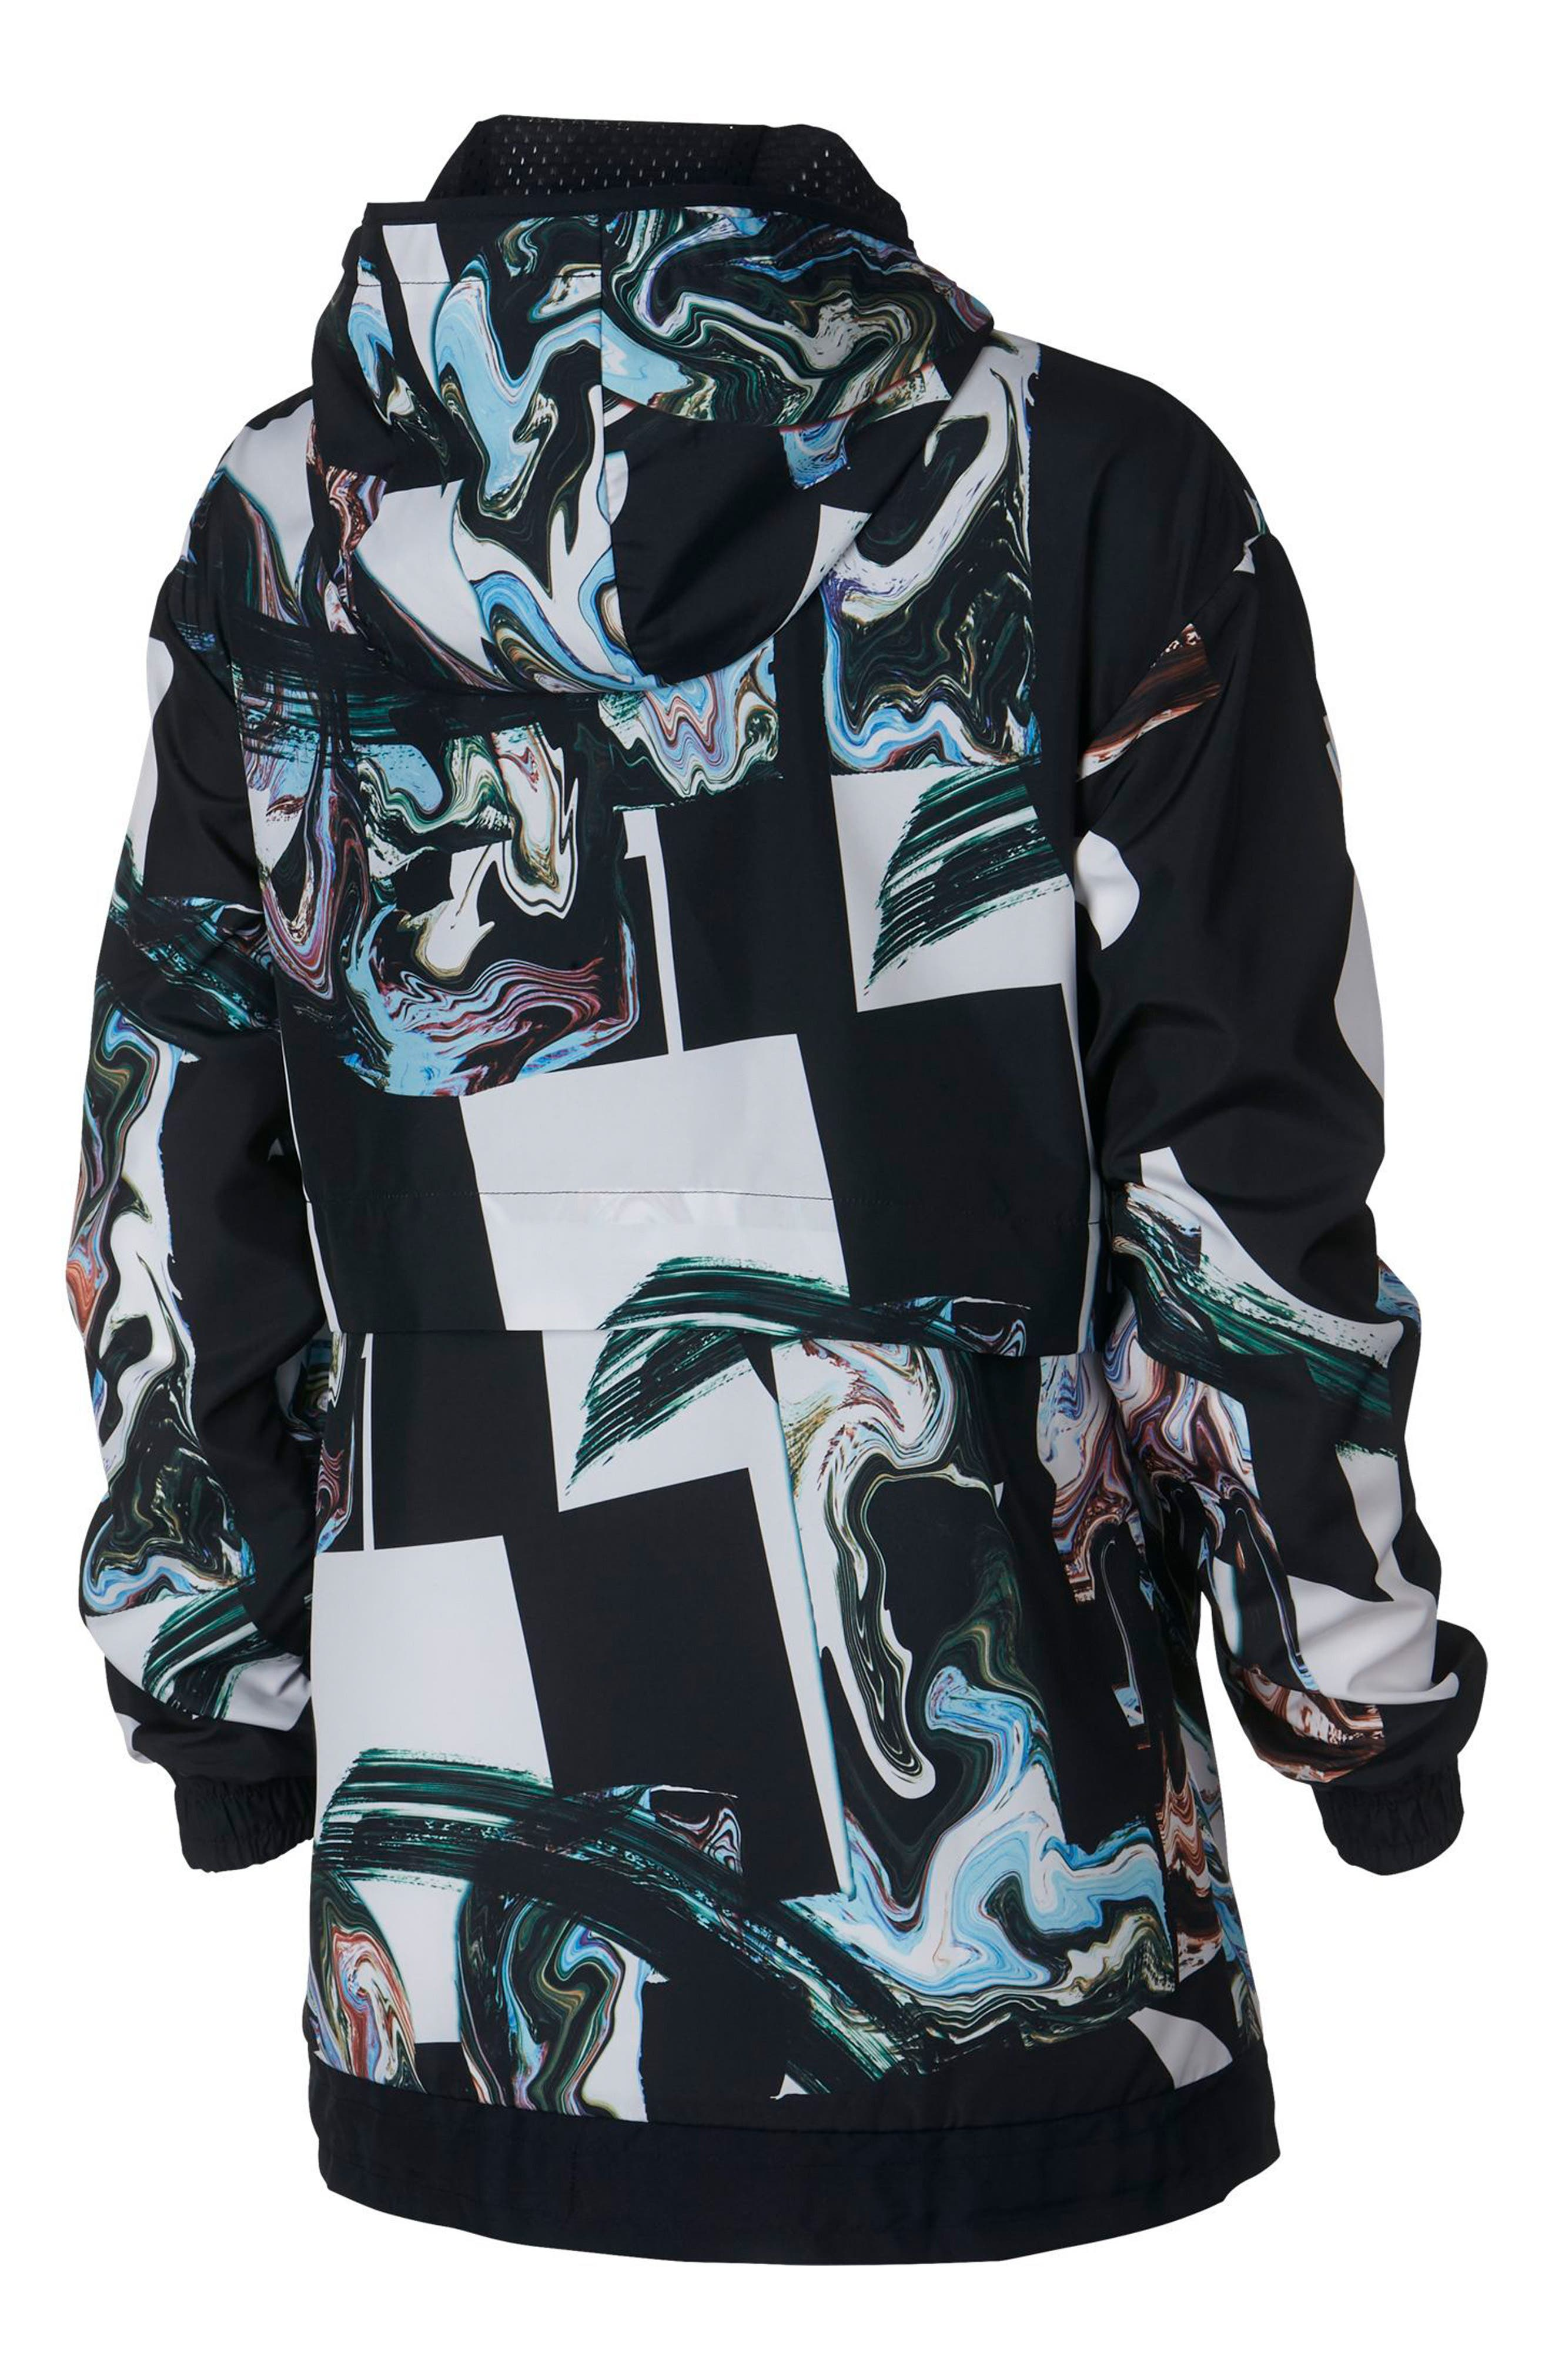 Sportswear Women's Marble Print Hooded Jacket,                             Alternate thumbnail 2, color,                             Black/ Black